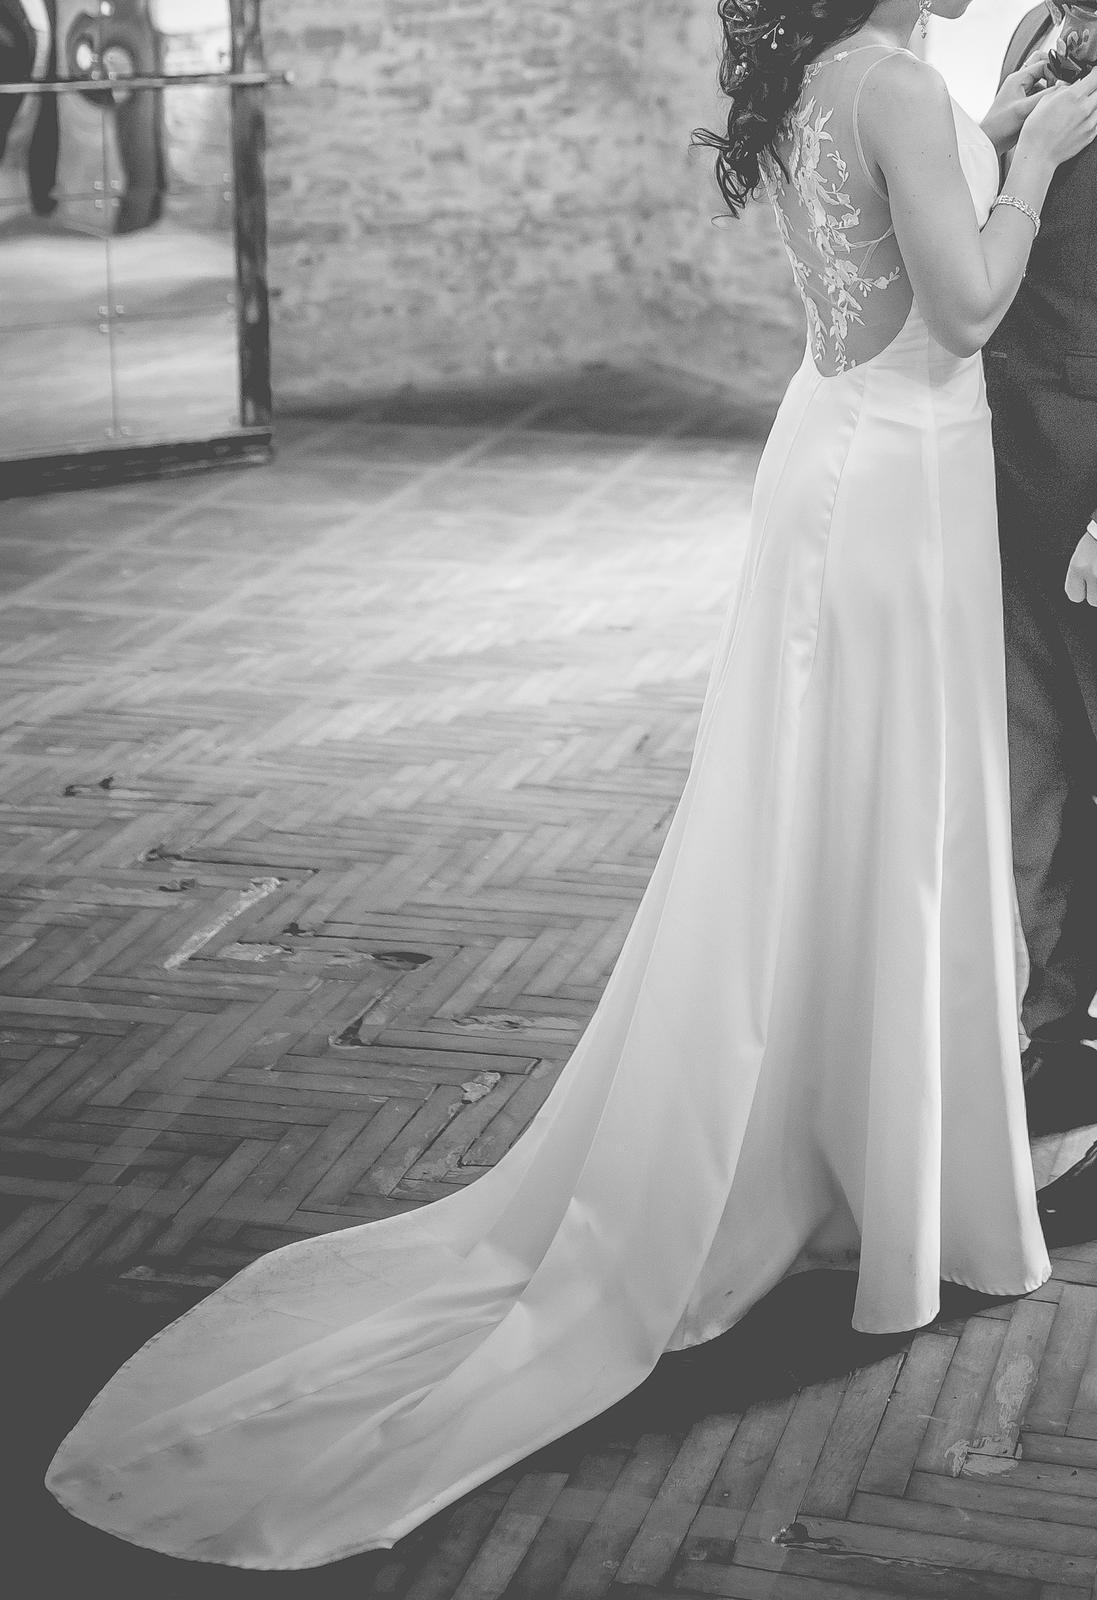 Svadobné šaty, jednoduché - Obrázok č. 1